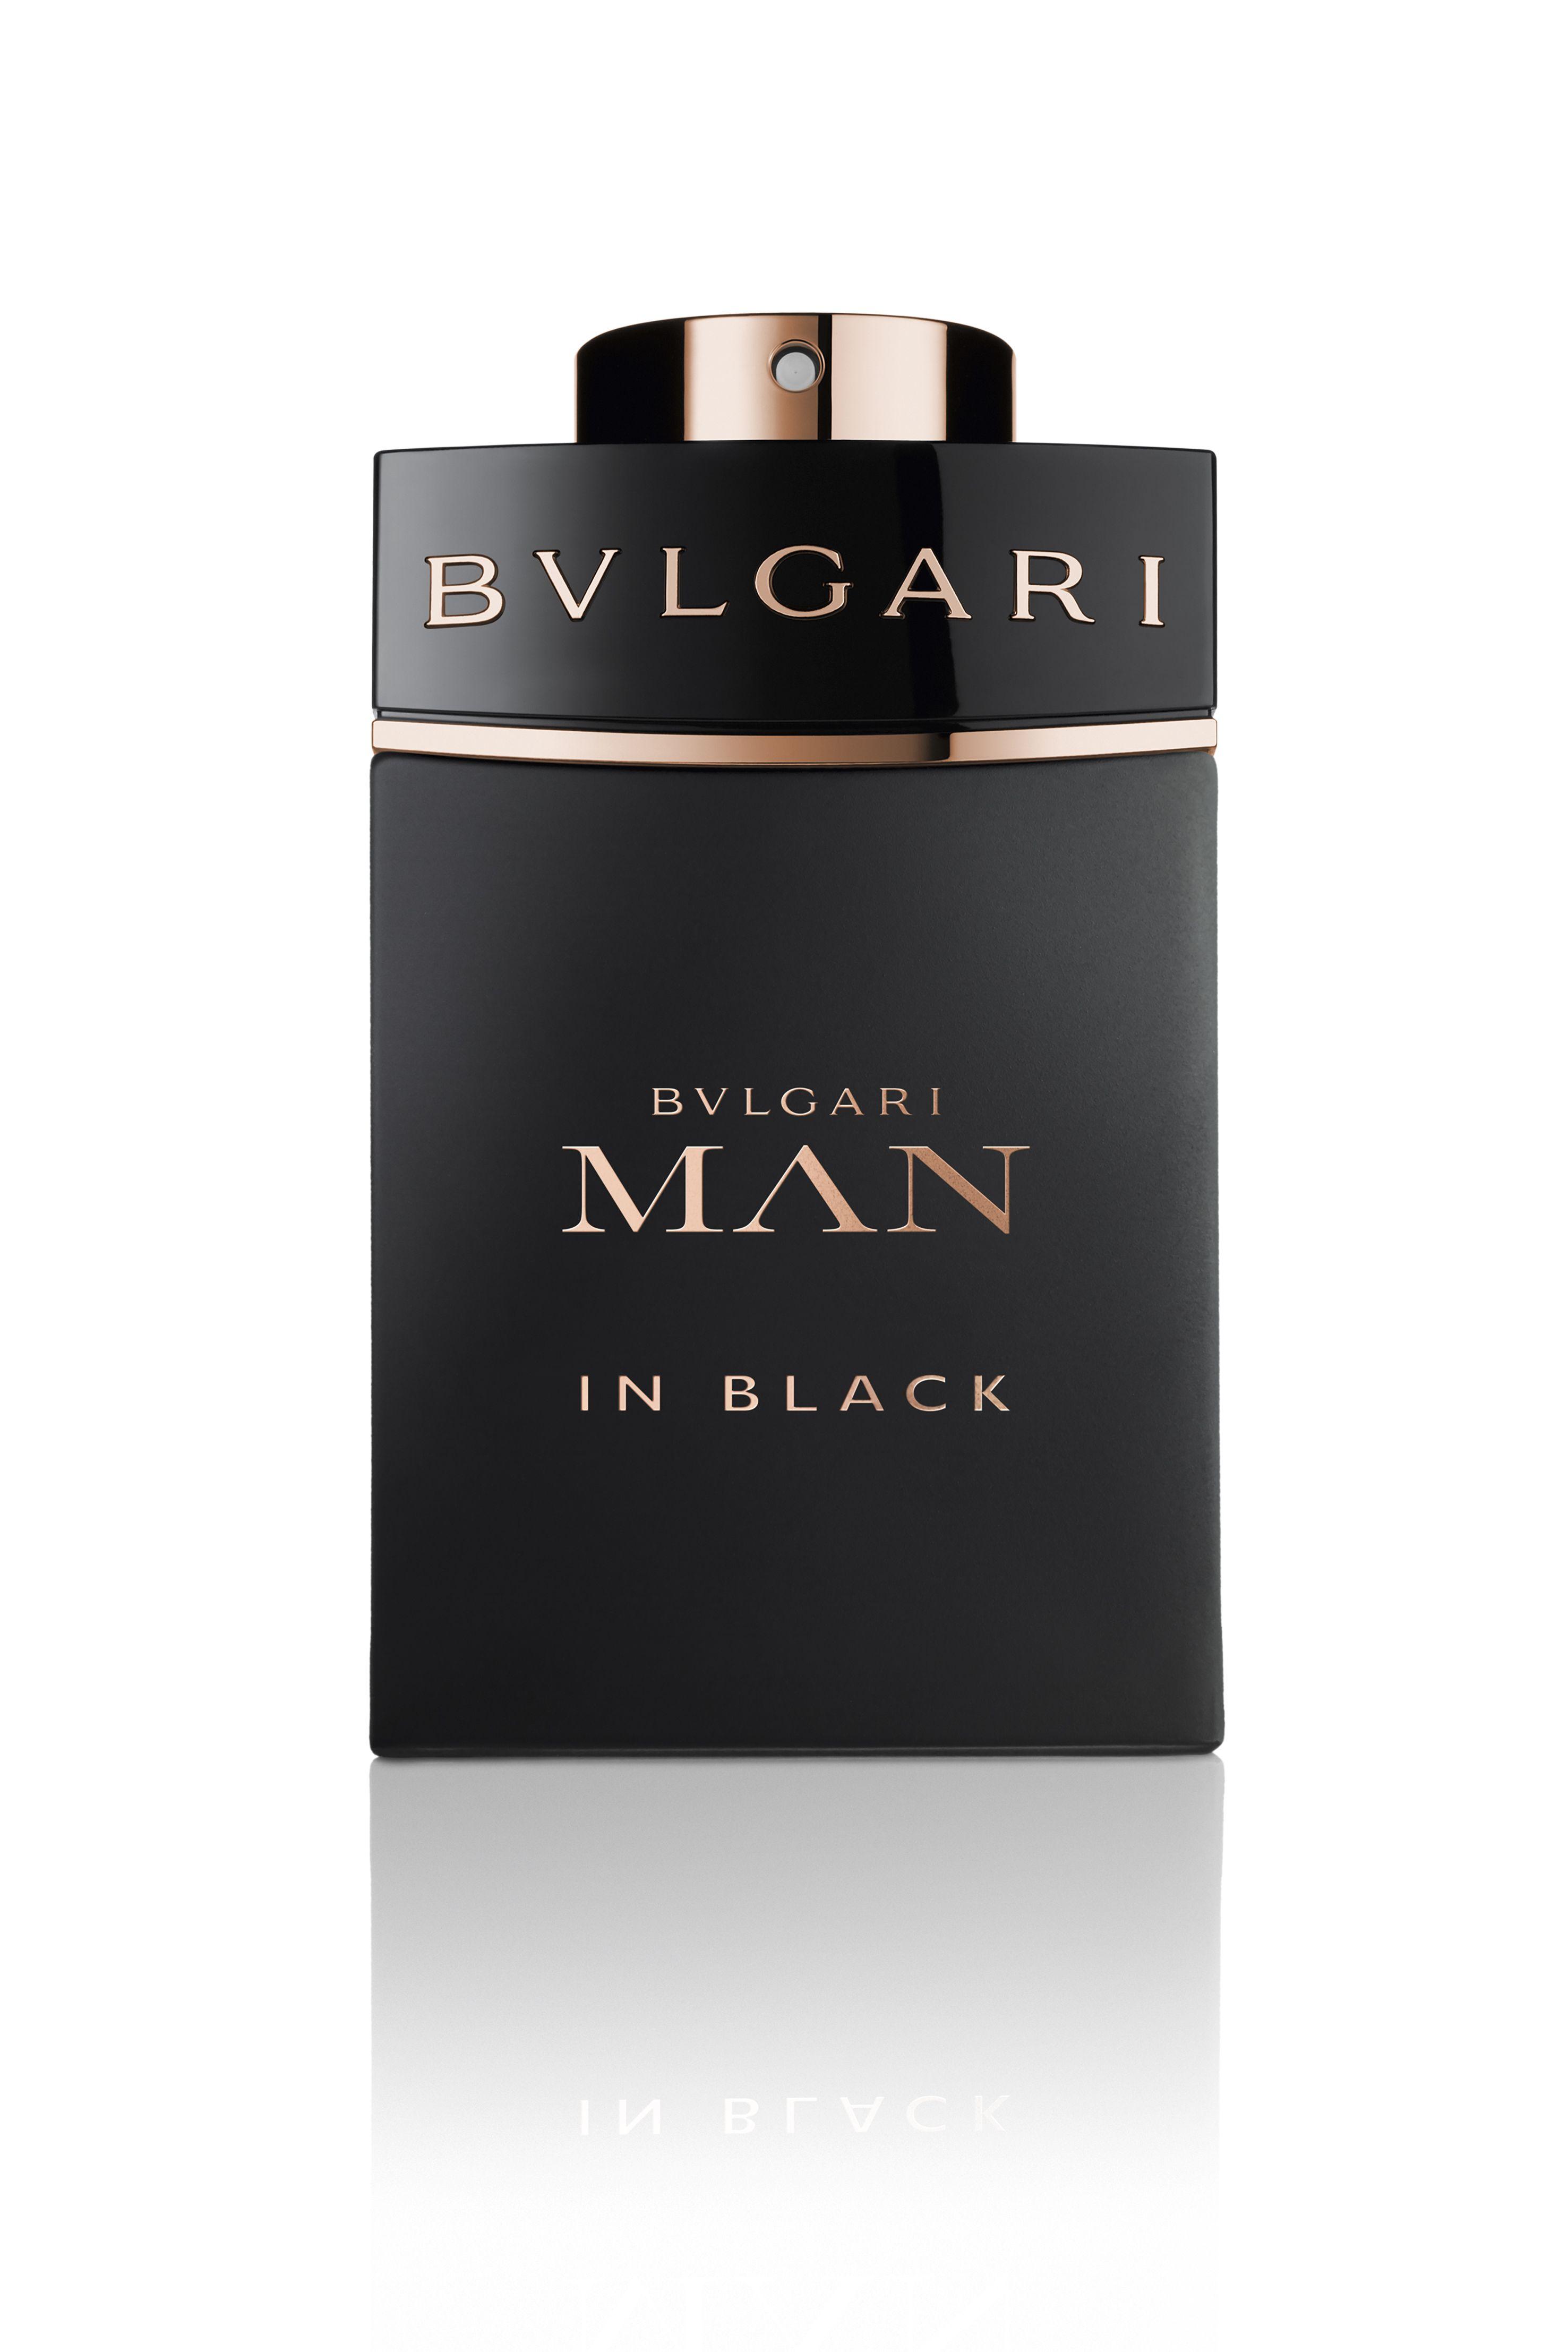 miglior profumo bulgari